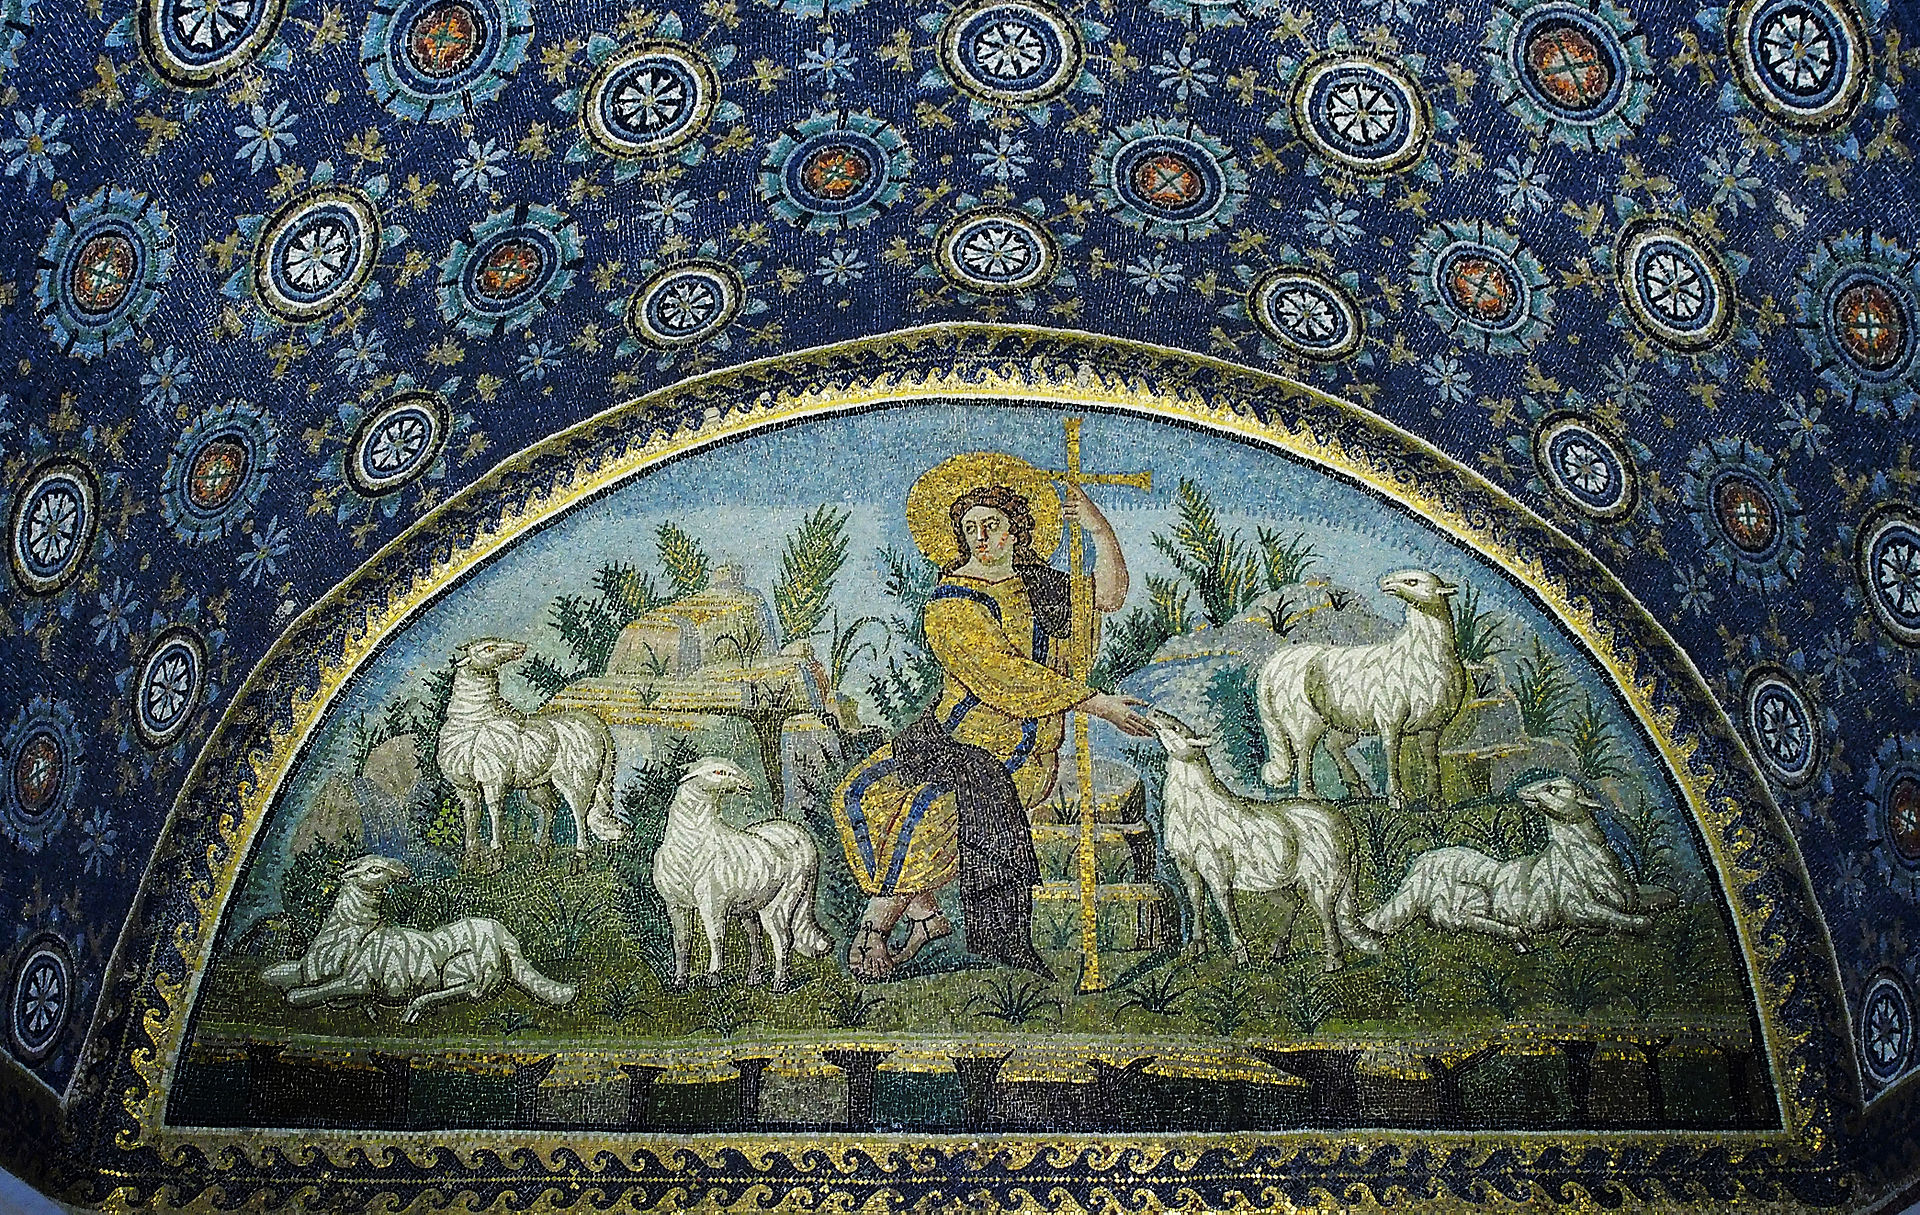 """The Good Shepherd"", 5th Century. Mosaic in the Mausoleum of Gala Placida, Ravenna, Italy."